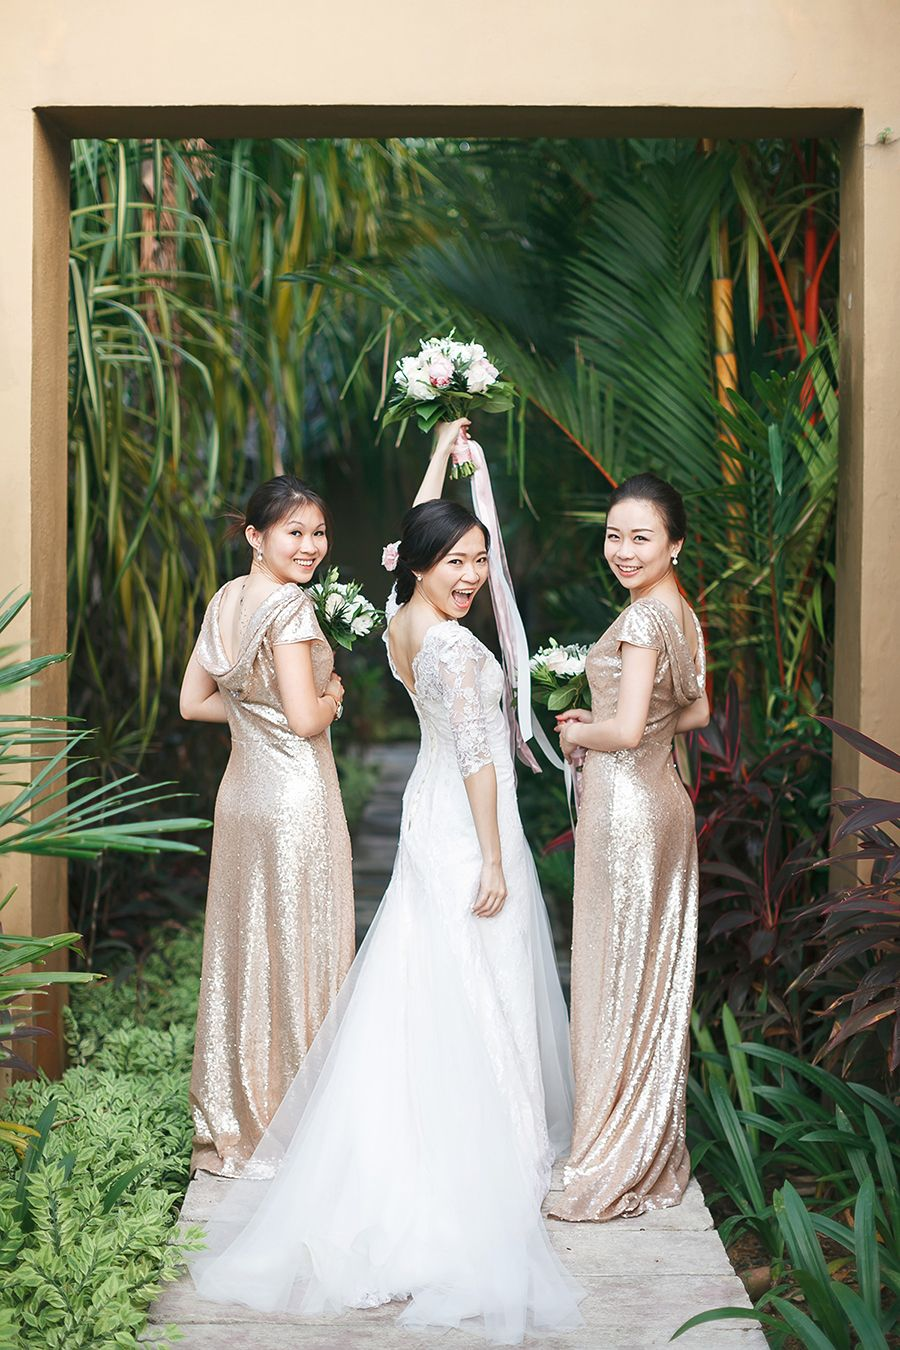 50th wedding anniversary dresses  Charlie and Cherlynus Wedding in Four Seasons Langkawi  Bridesmaids